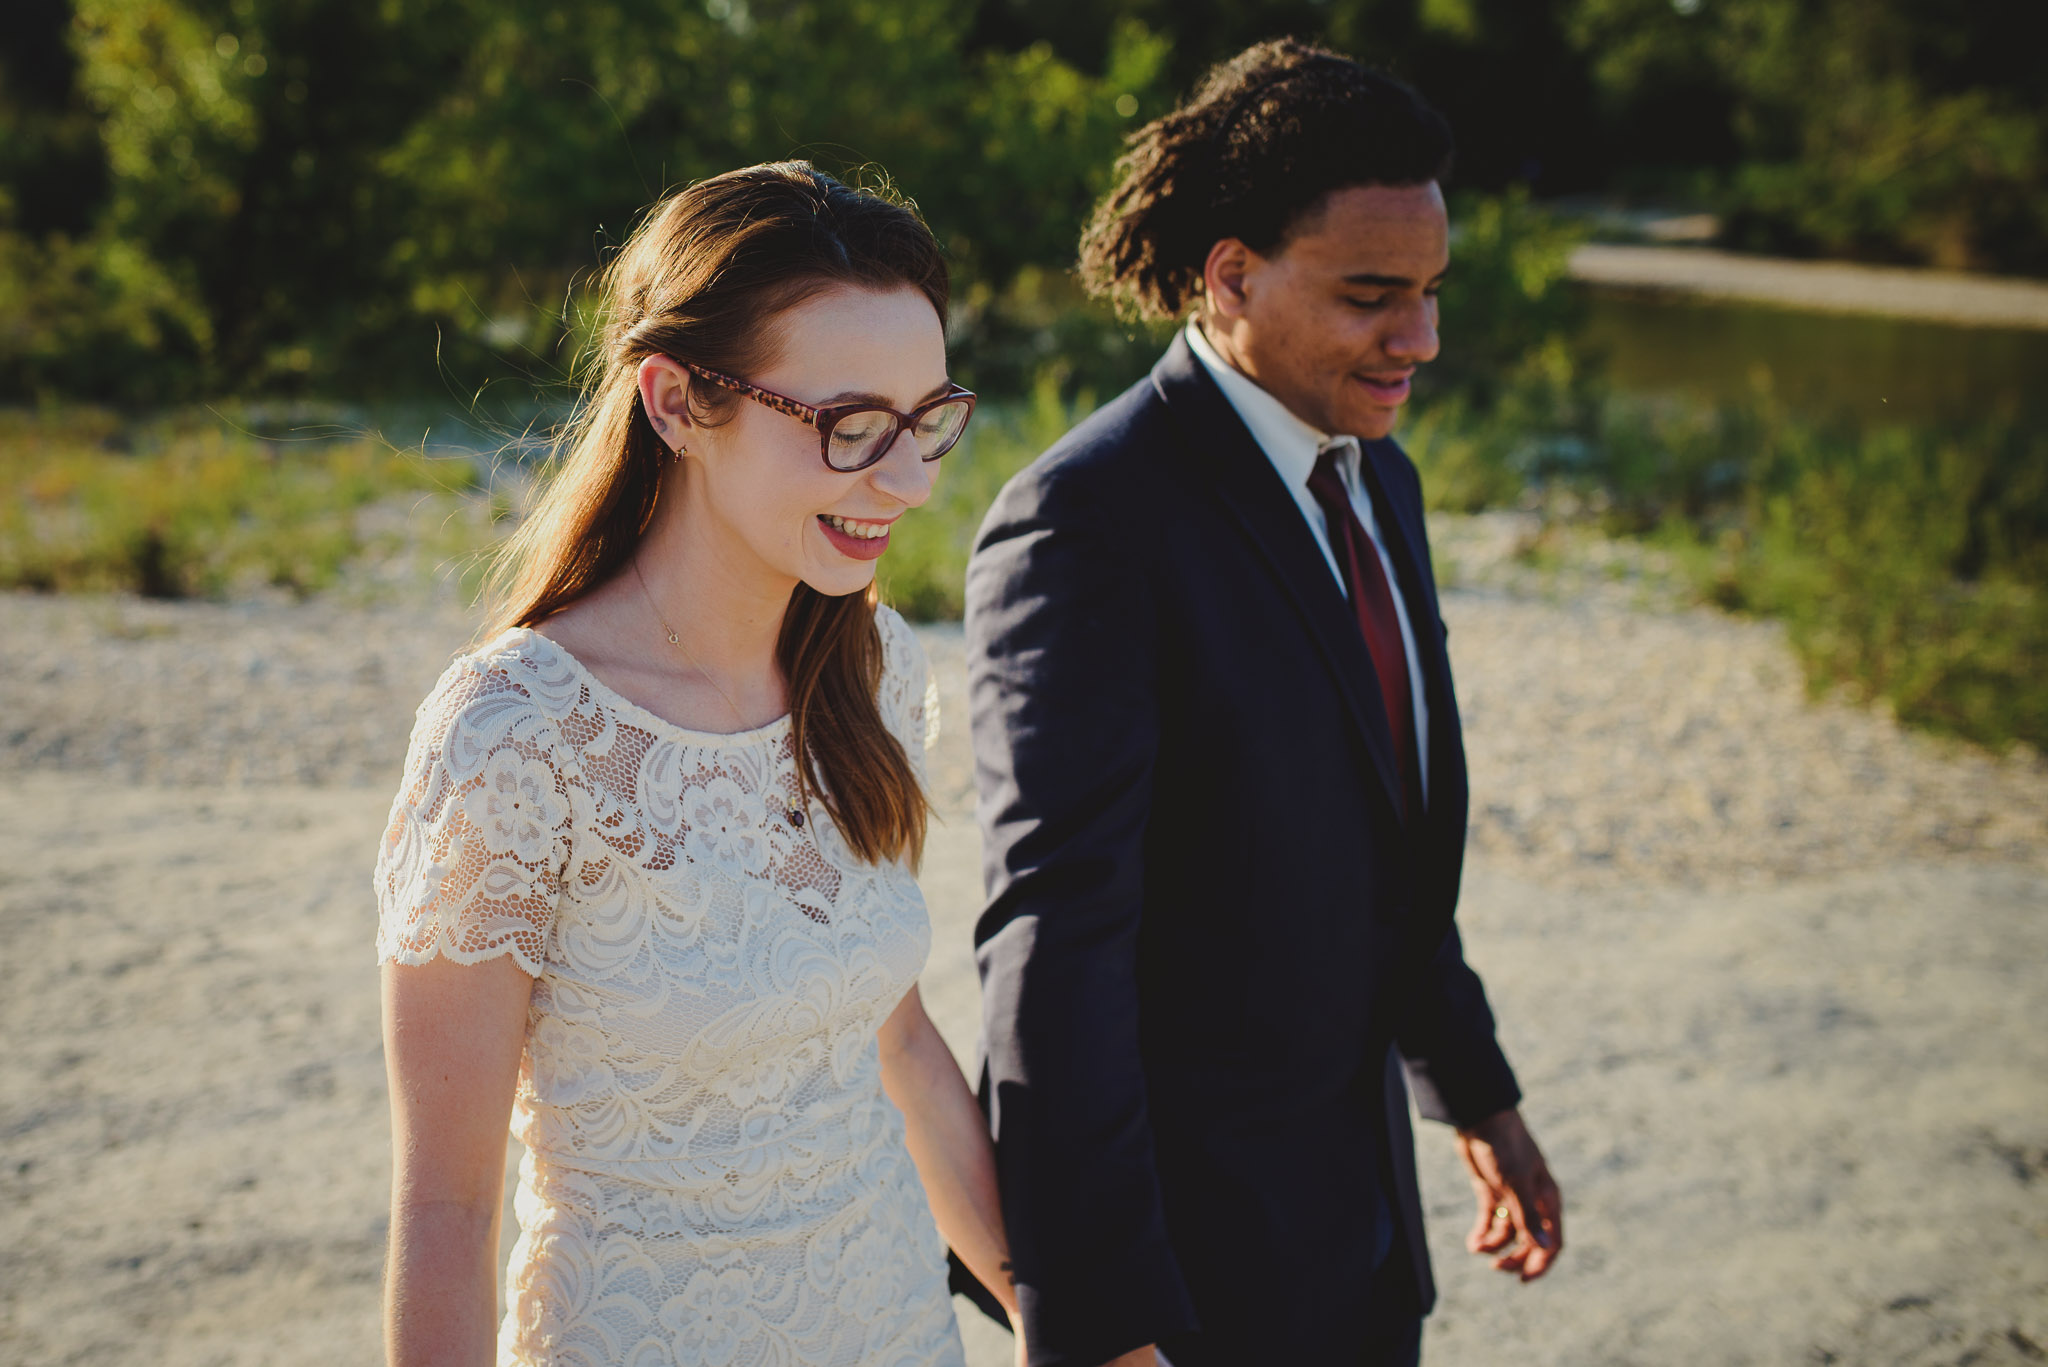 Austin-texas-wedding-photographer-McKinney-Falls-State-Park-0005.jpg